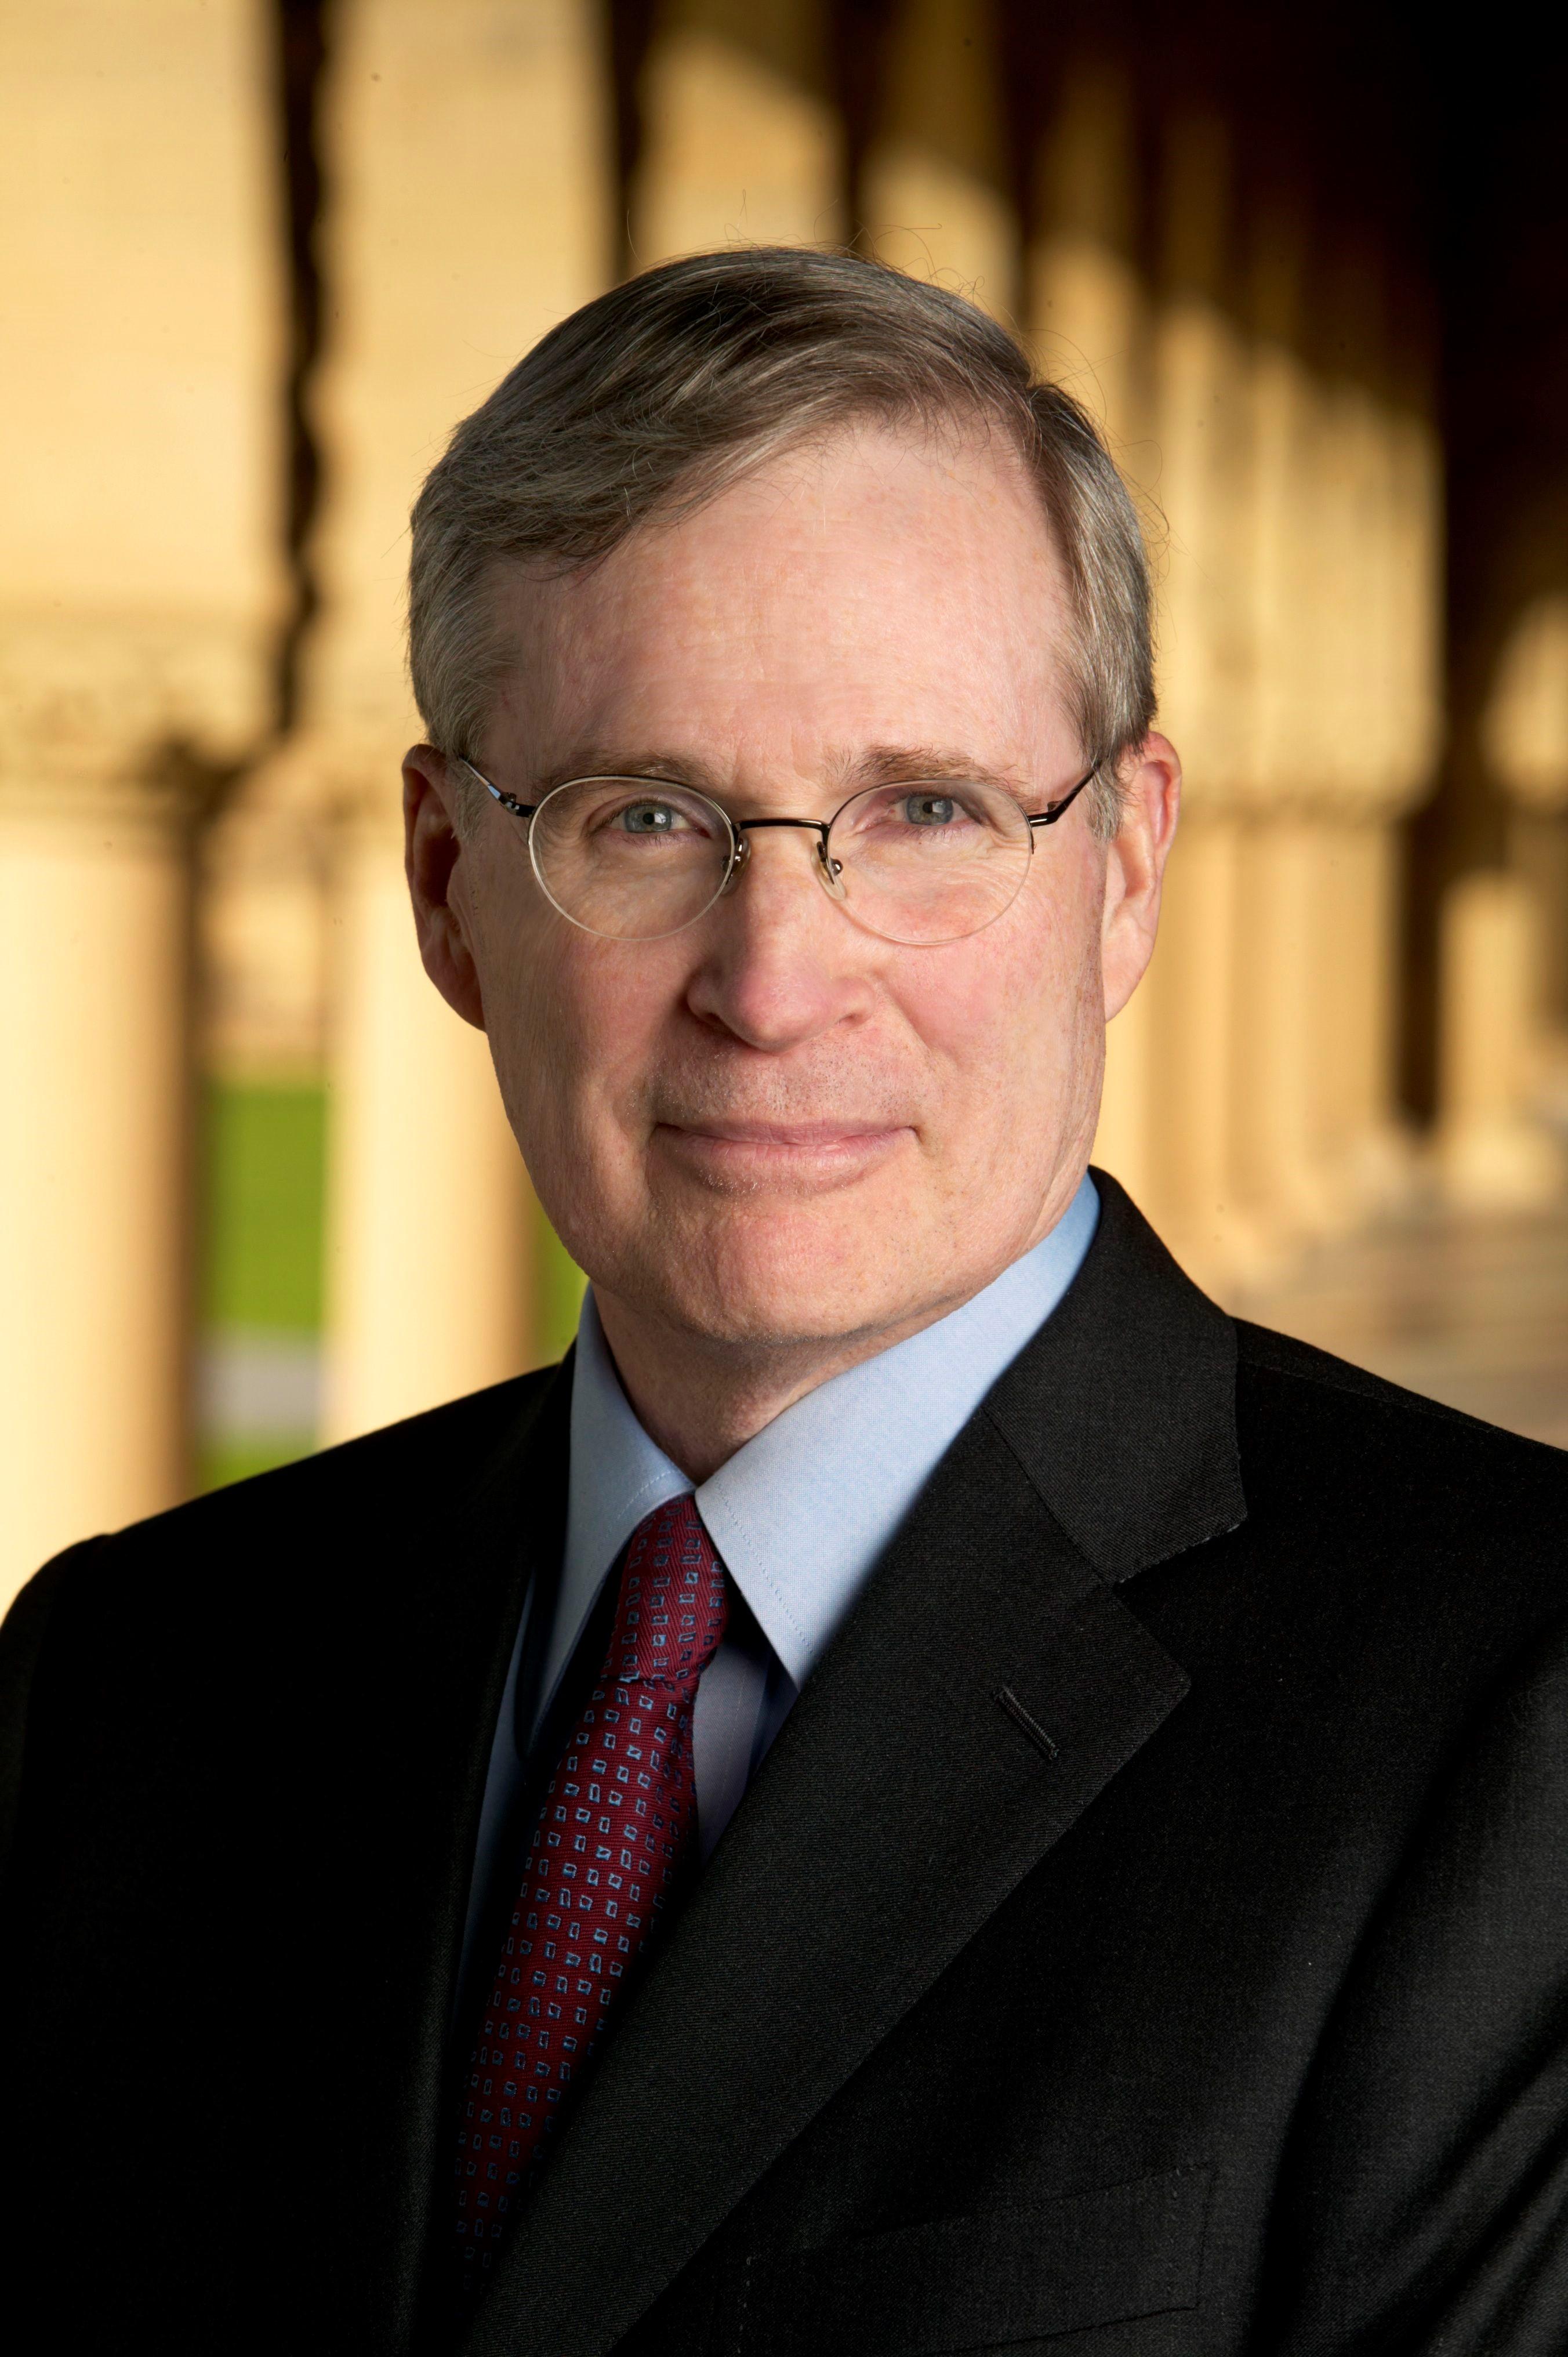 Stephen Hadley